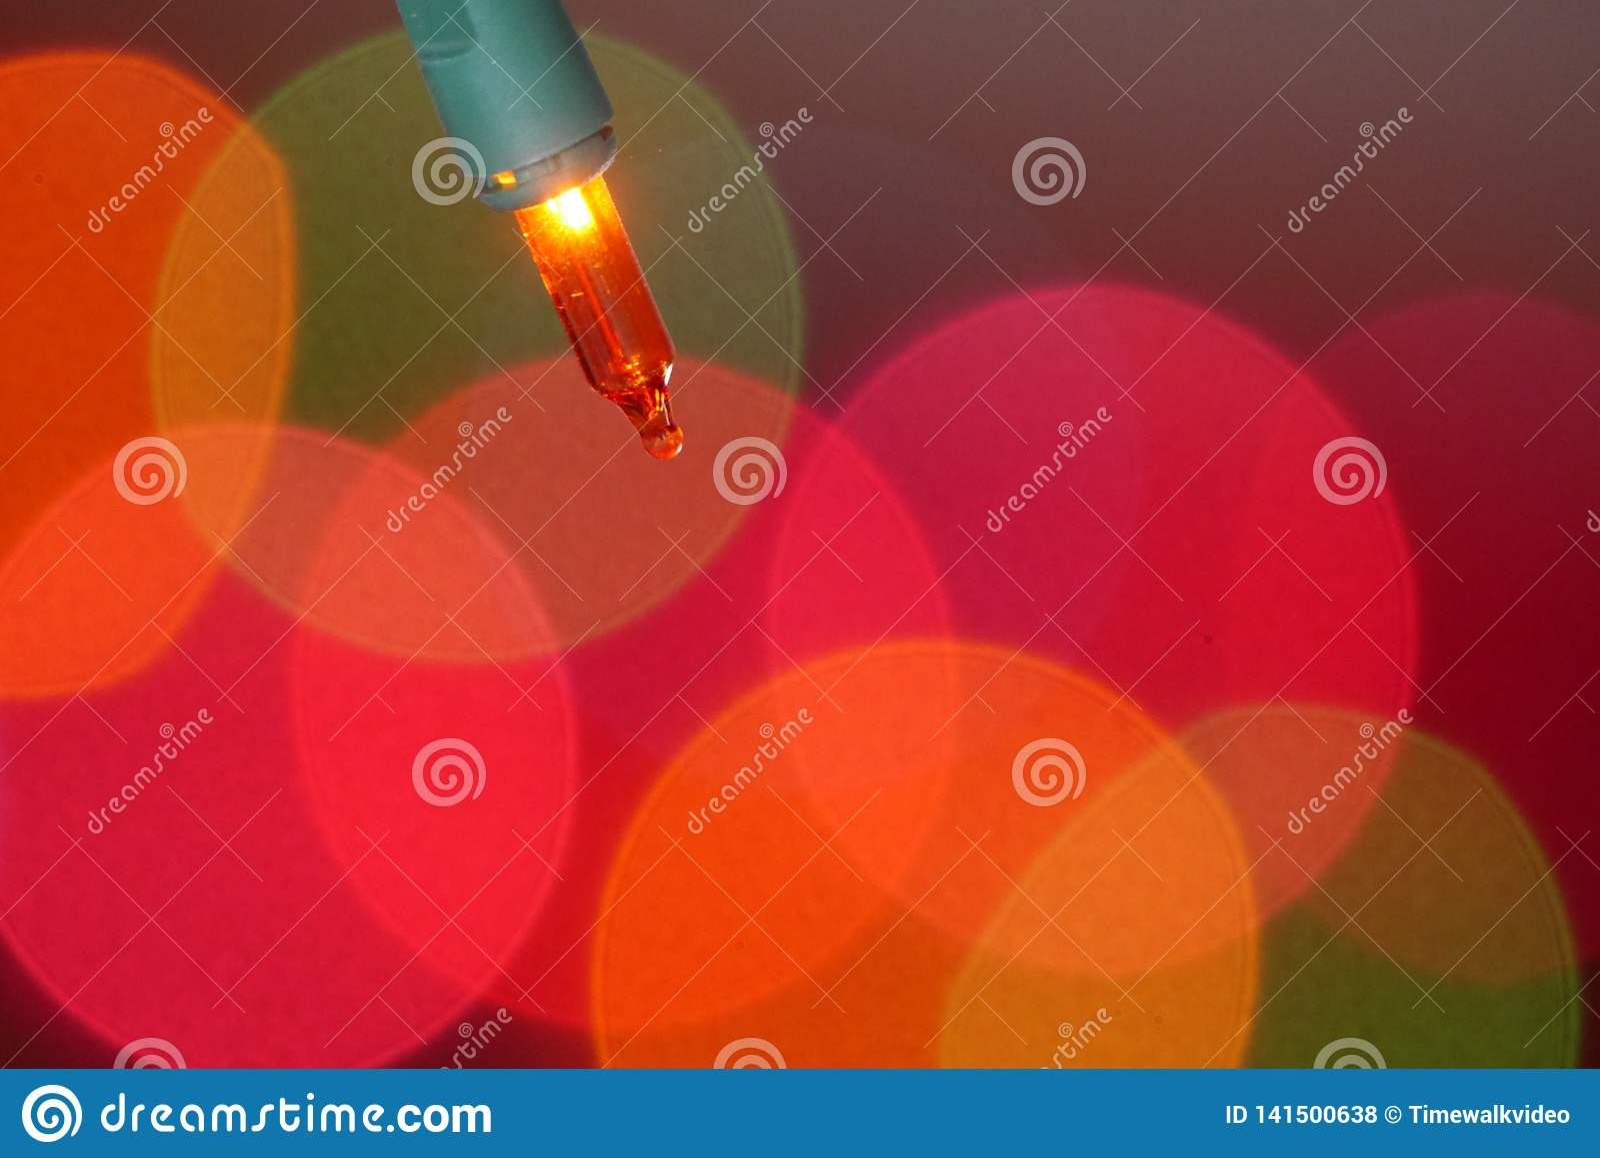 Gorgeous shot of Orange Christmas tree lightbulb